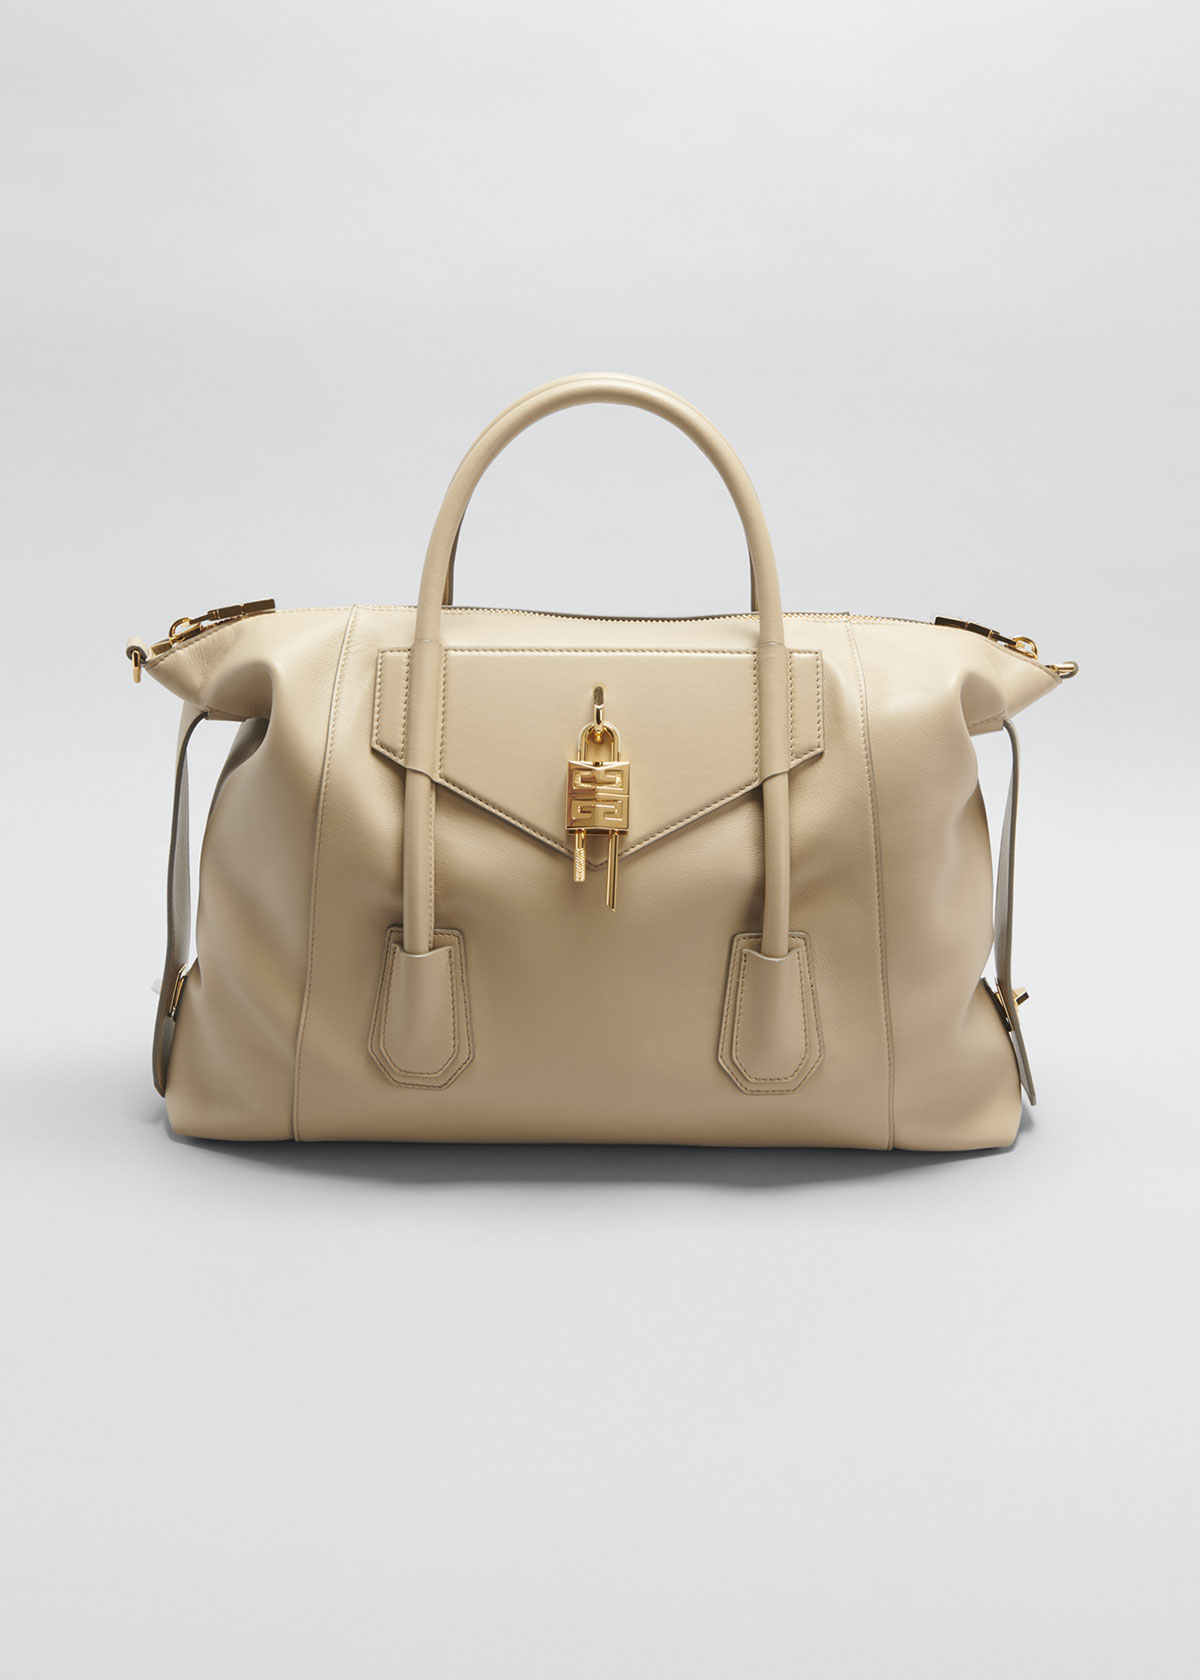 Givenchy MEDIUM ANTIGONA SOFT BAG WITH LOCK